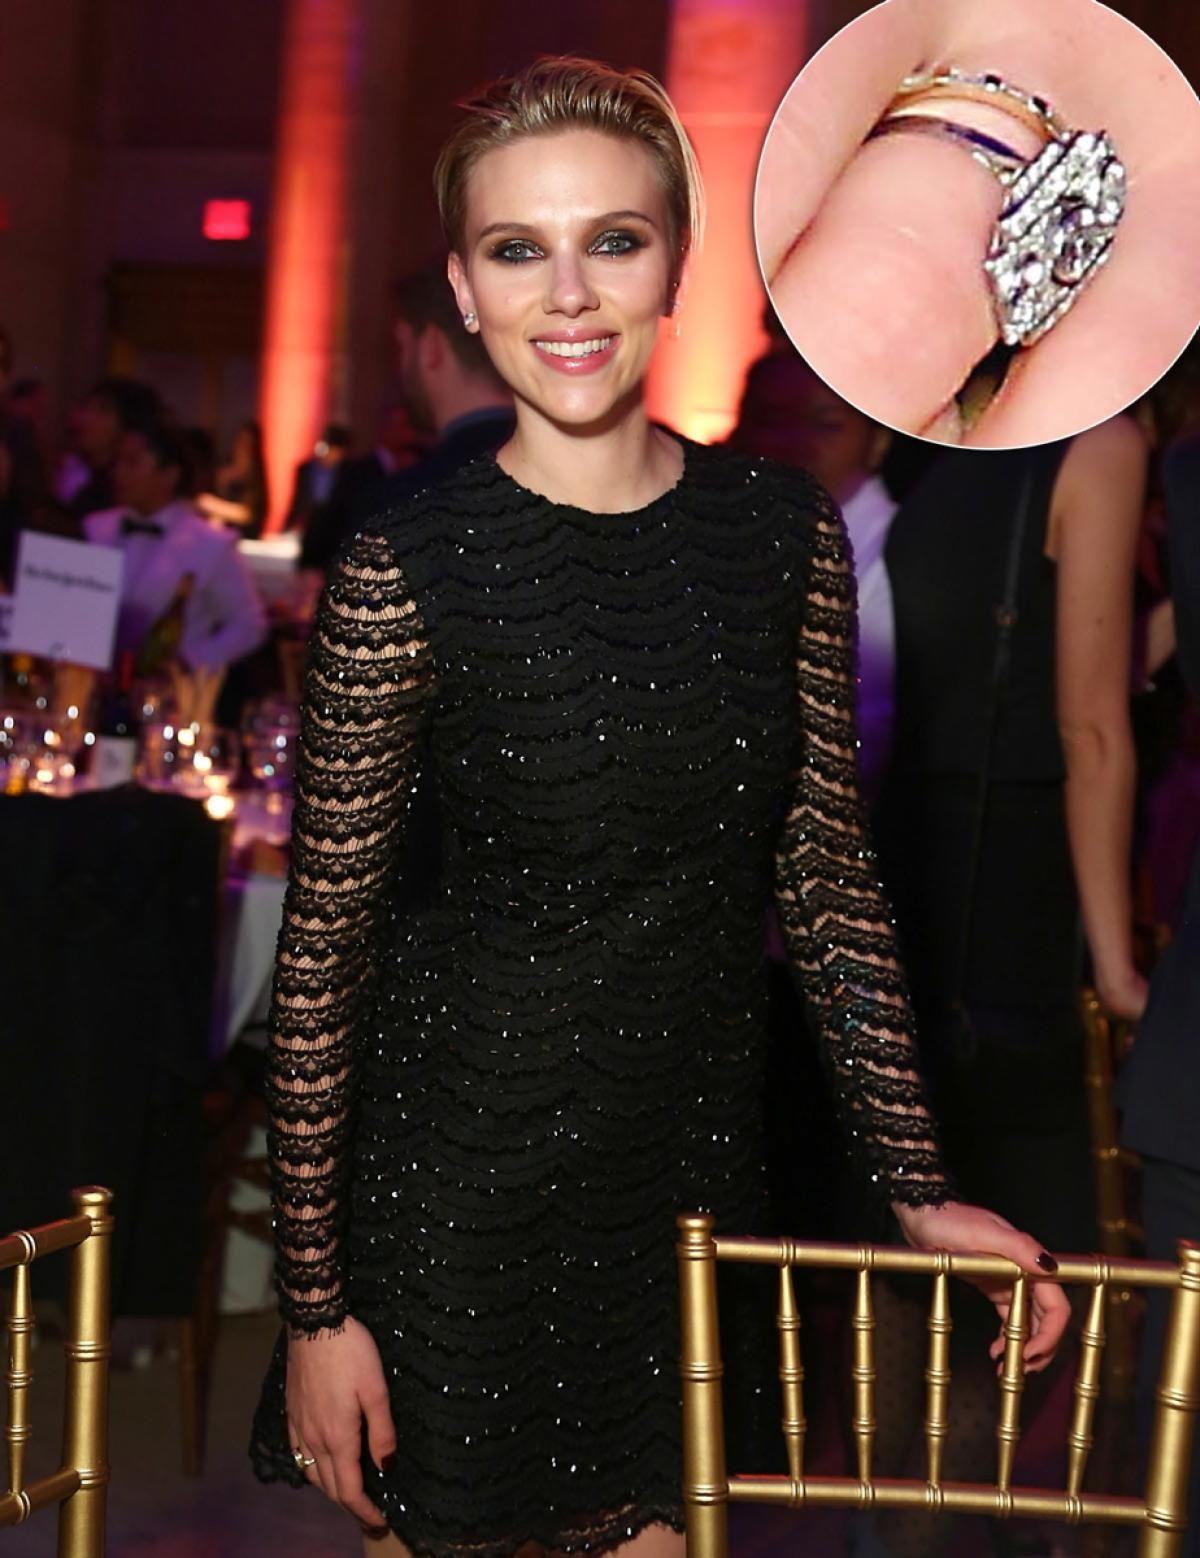 Scarlett Johansson Photos Celebrity bling and